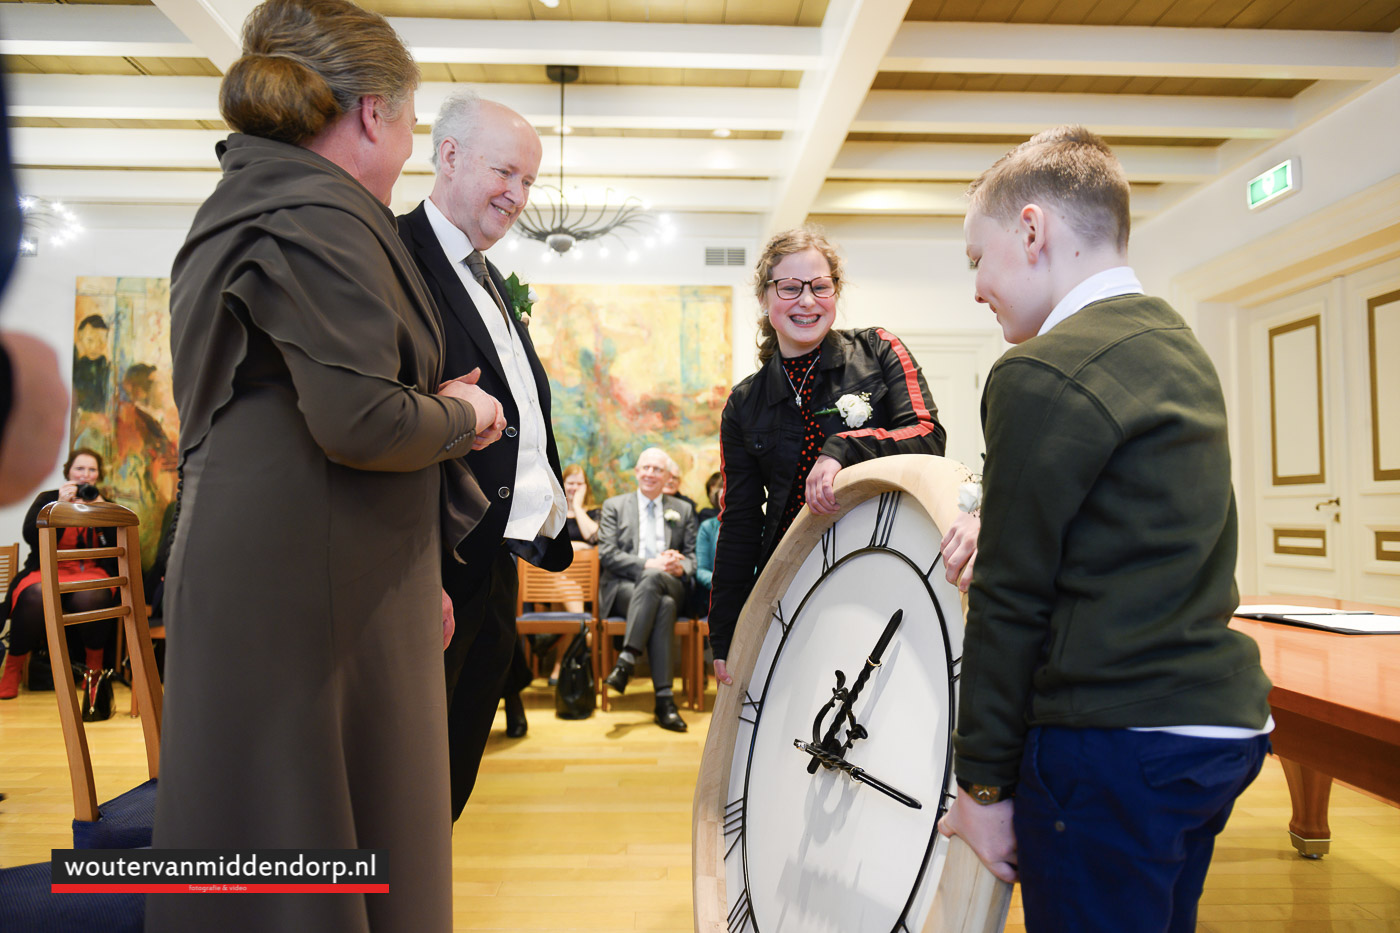 bruidsfotografie Wouter van Middendorp Uddel Elspeet Barneveld, omgeving trouwfotograaf-32